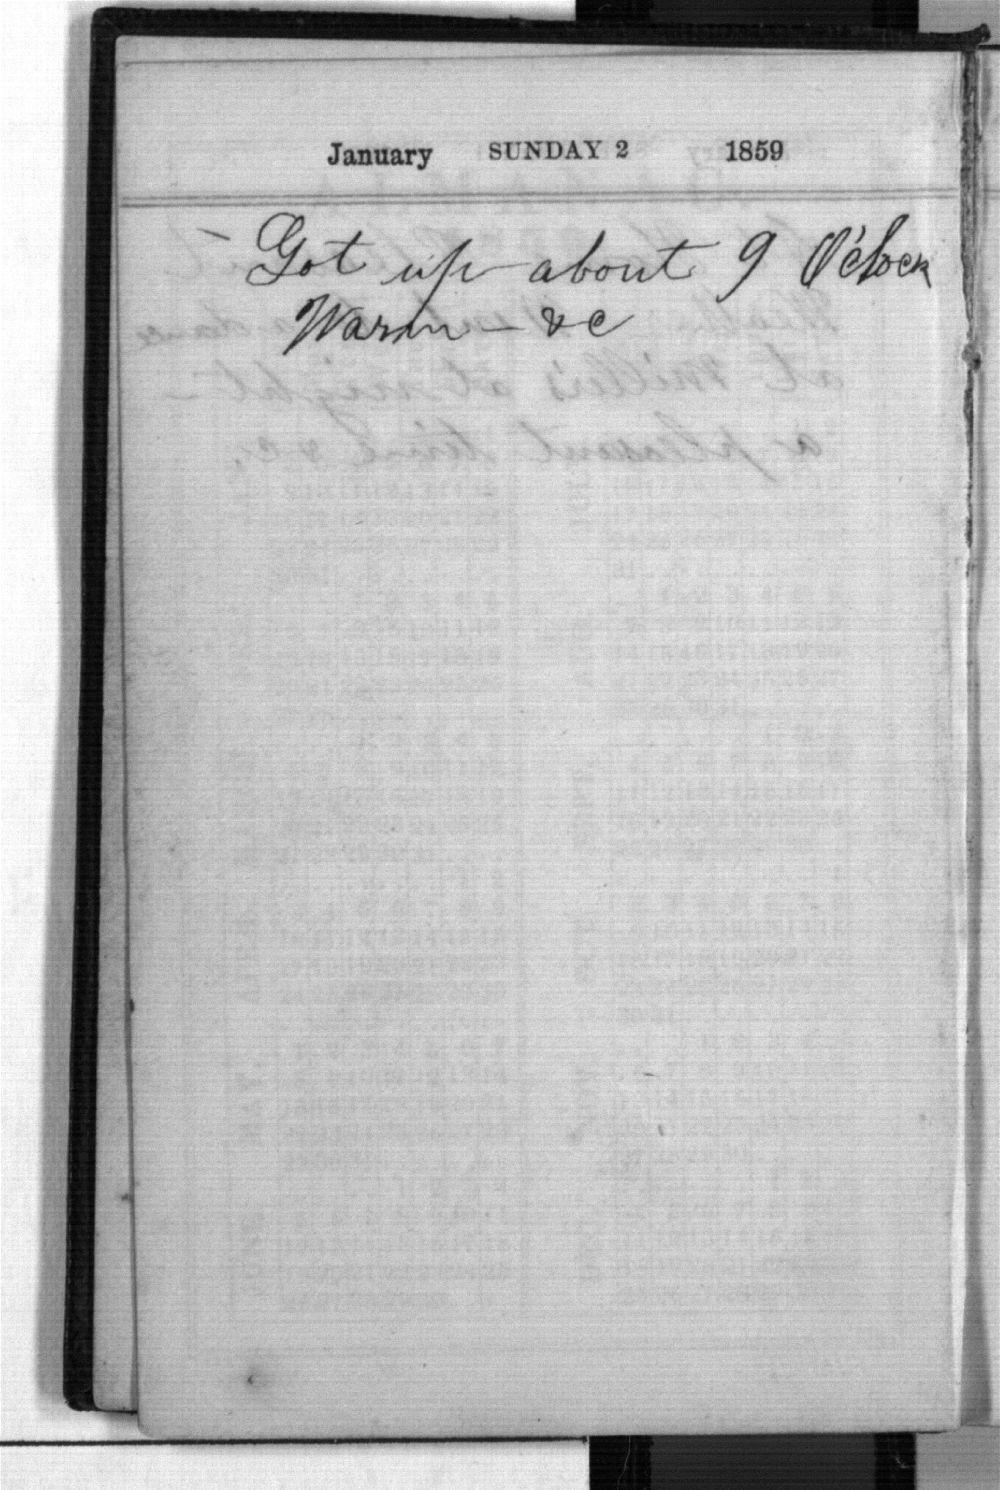 Daniel Mulford Valentine's diary - Jan 2